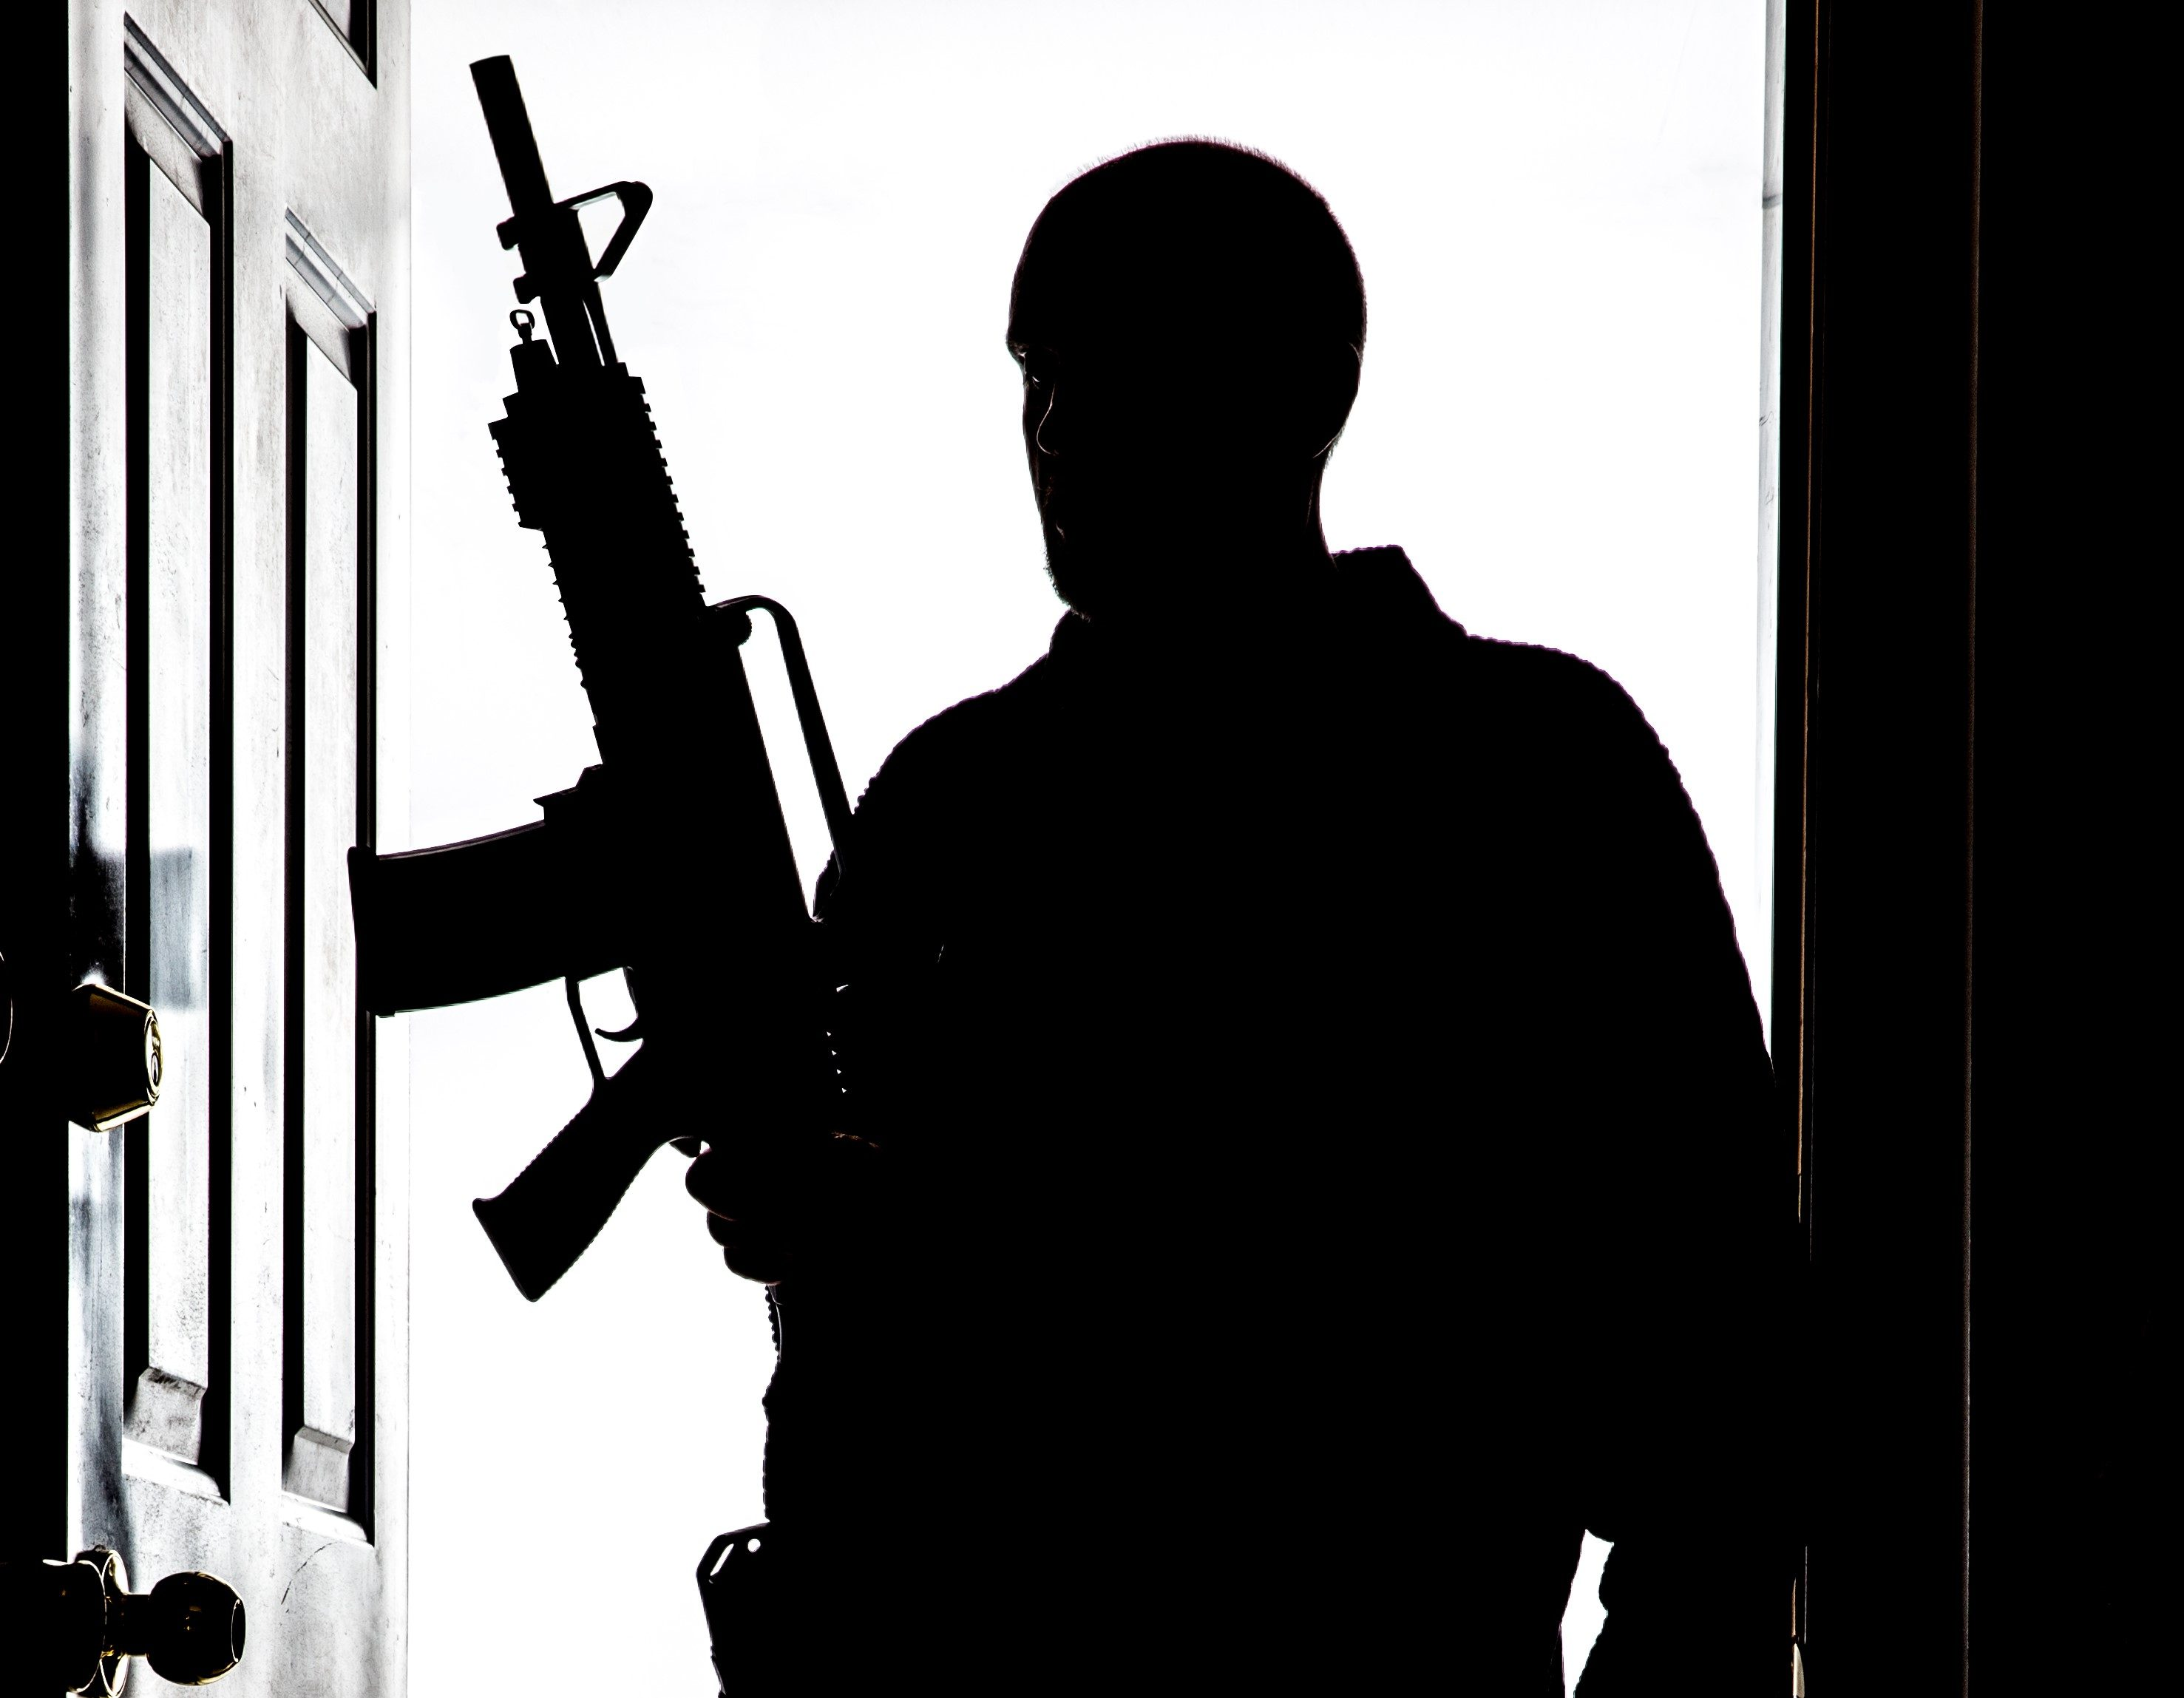 Male Shooter with an AR15 gun